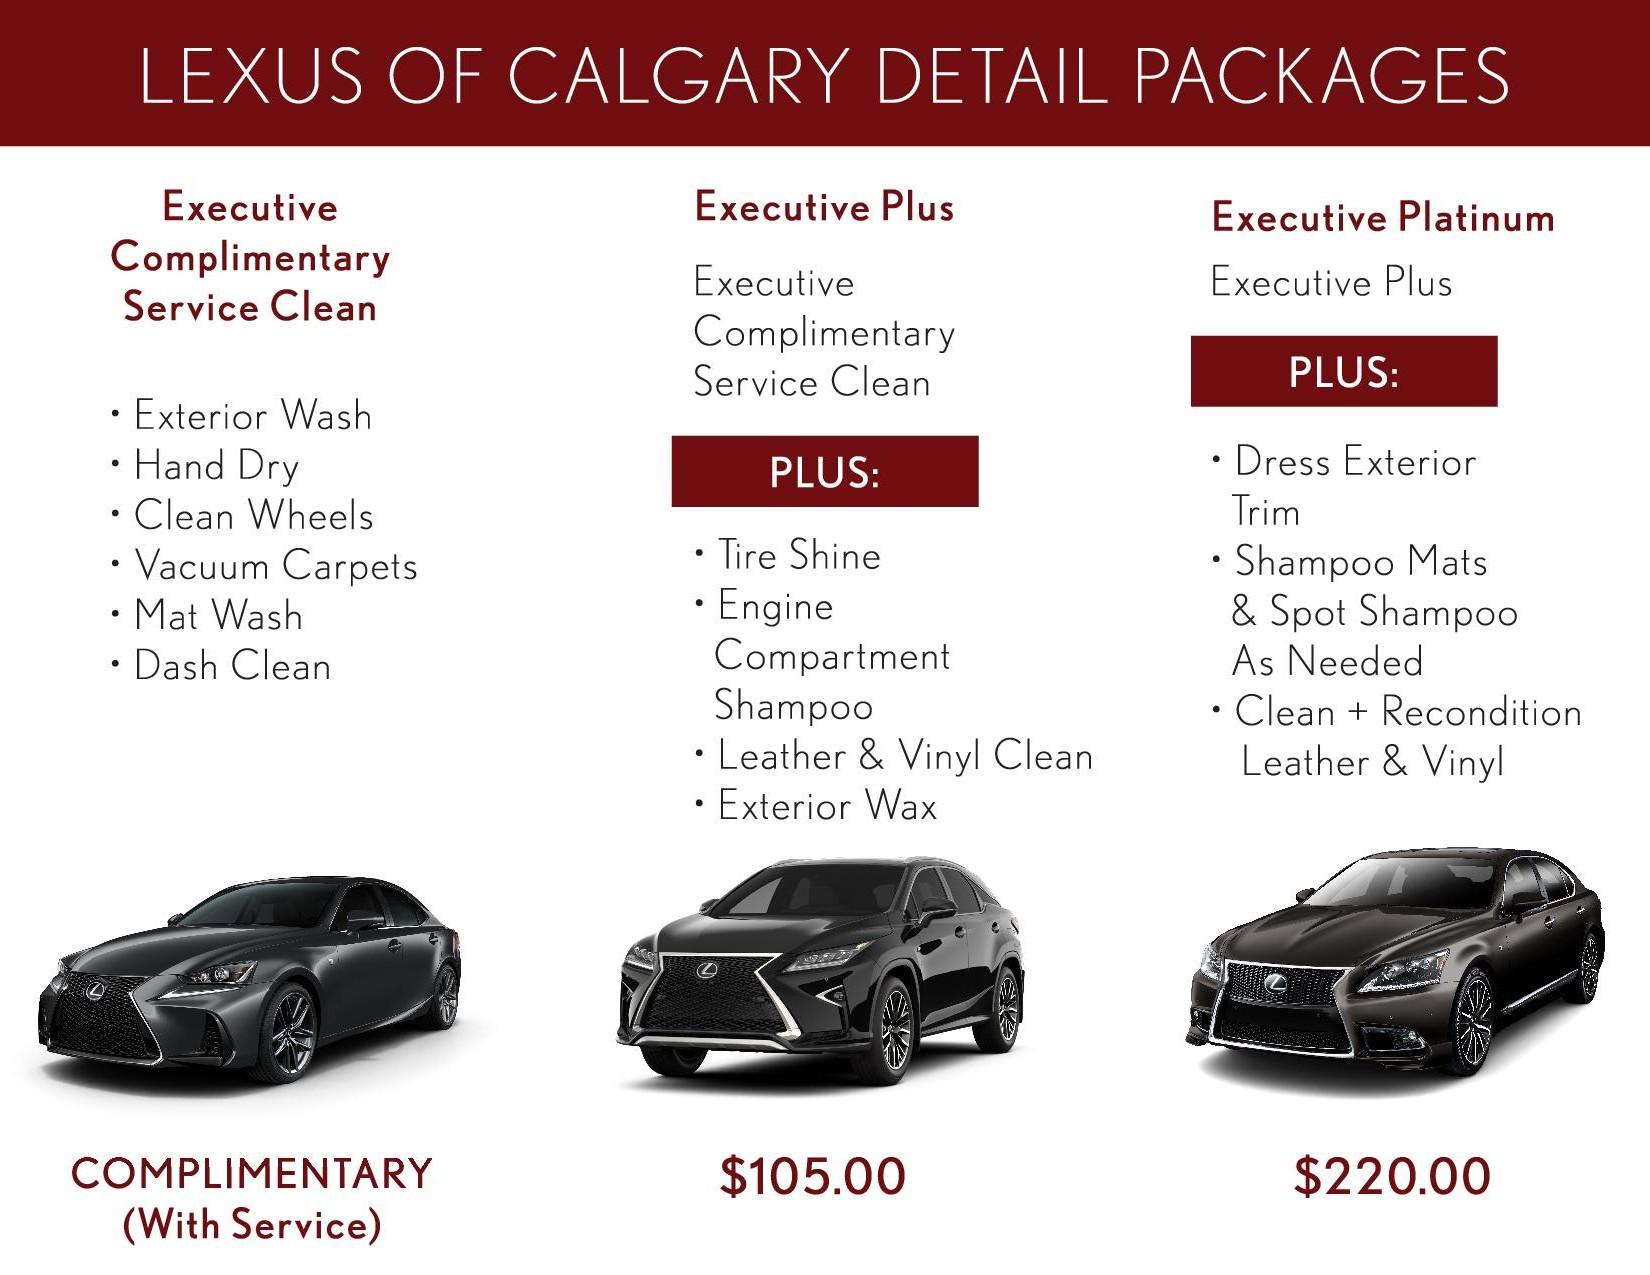 Lexus Car Detailing Service in Calgary